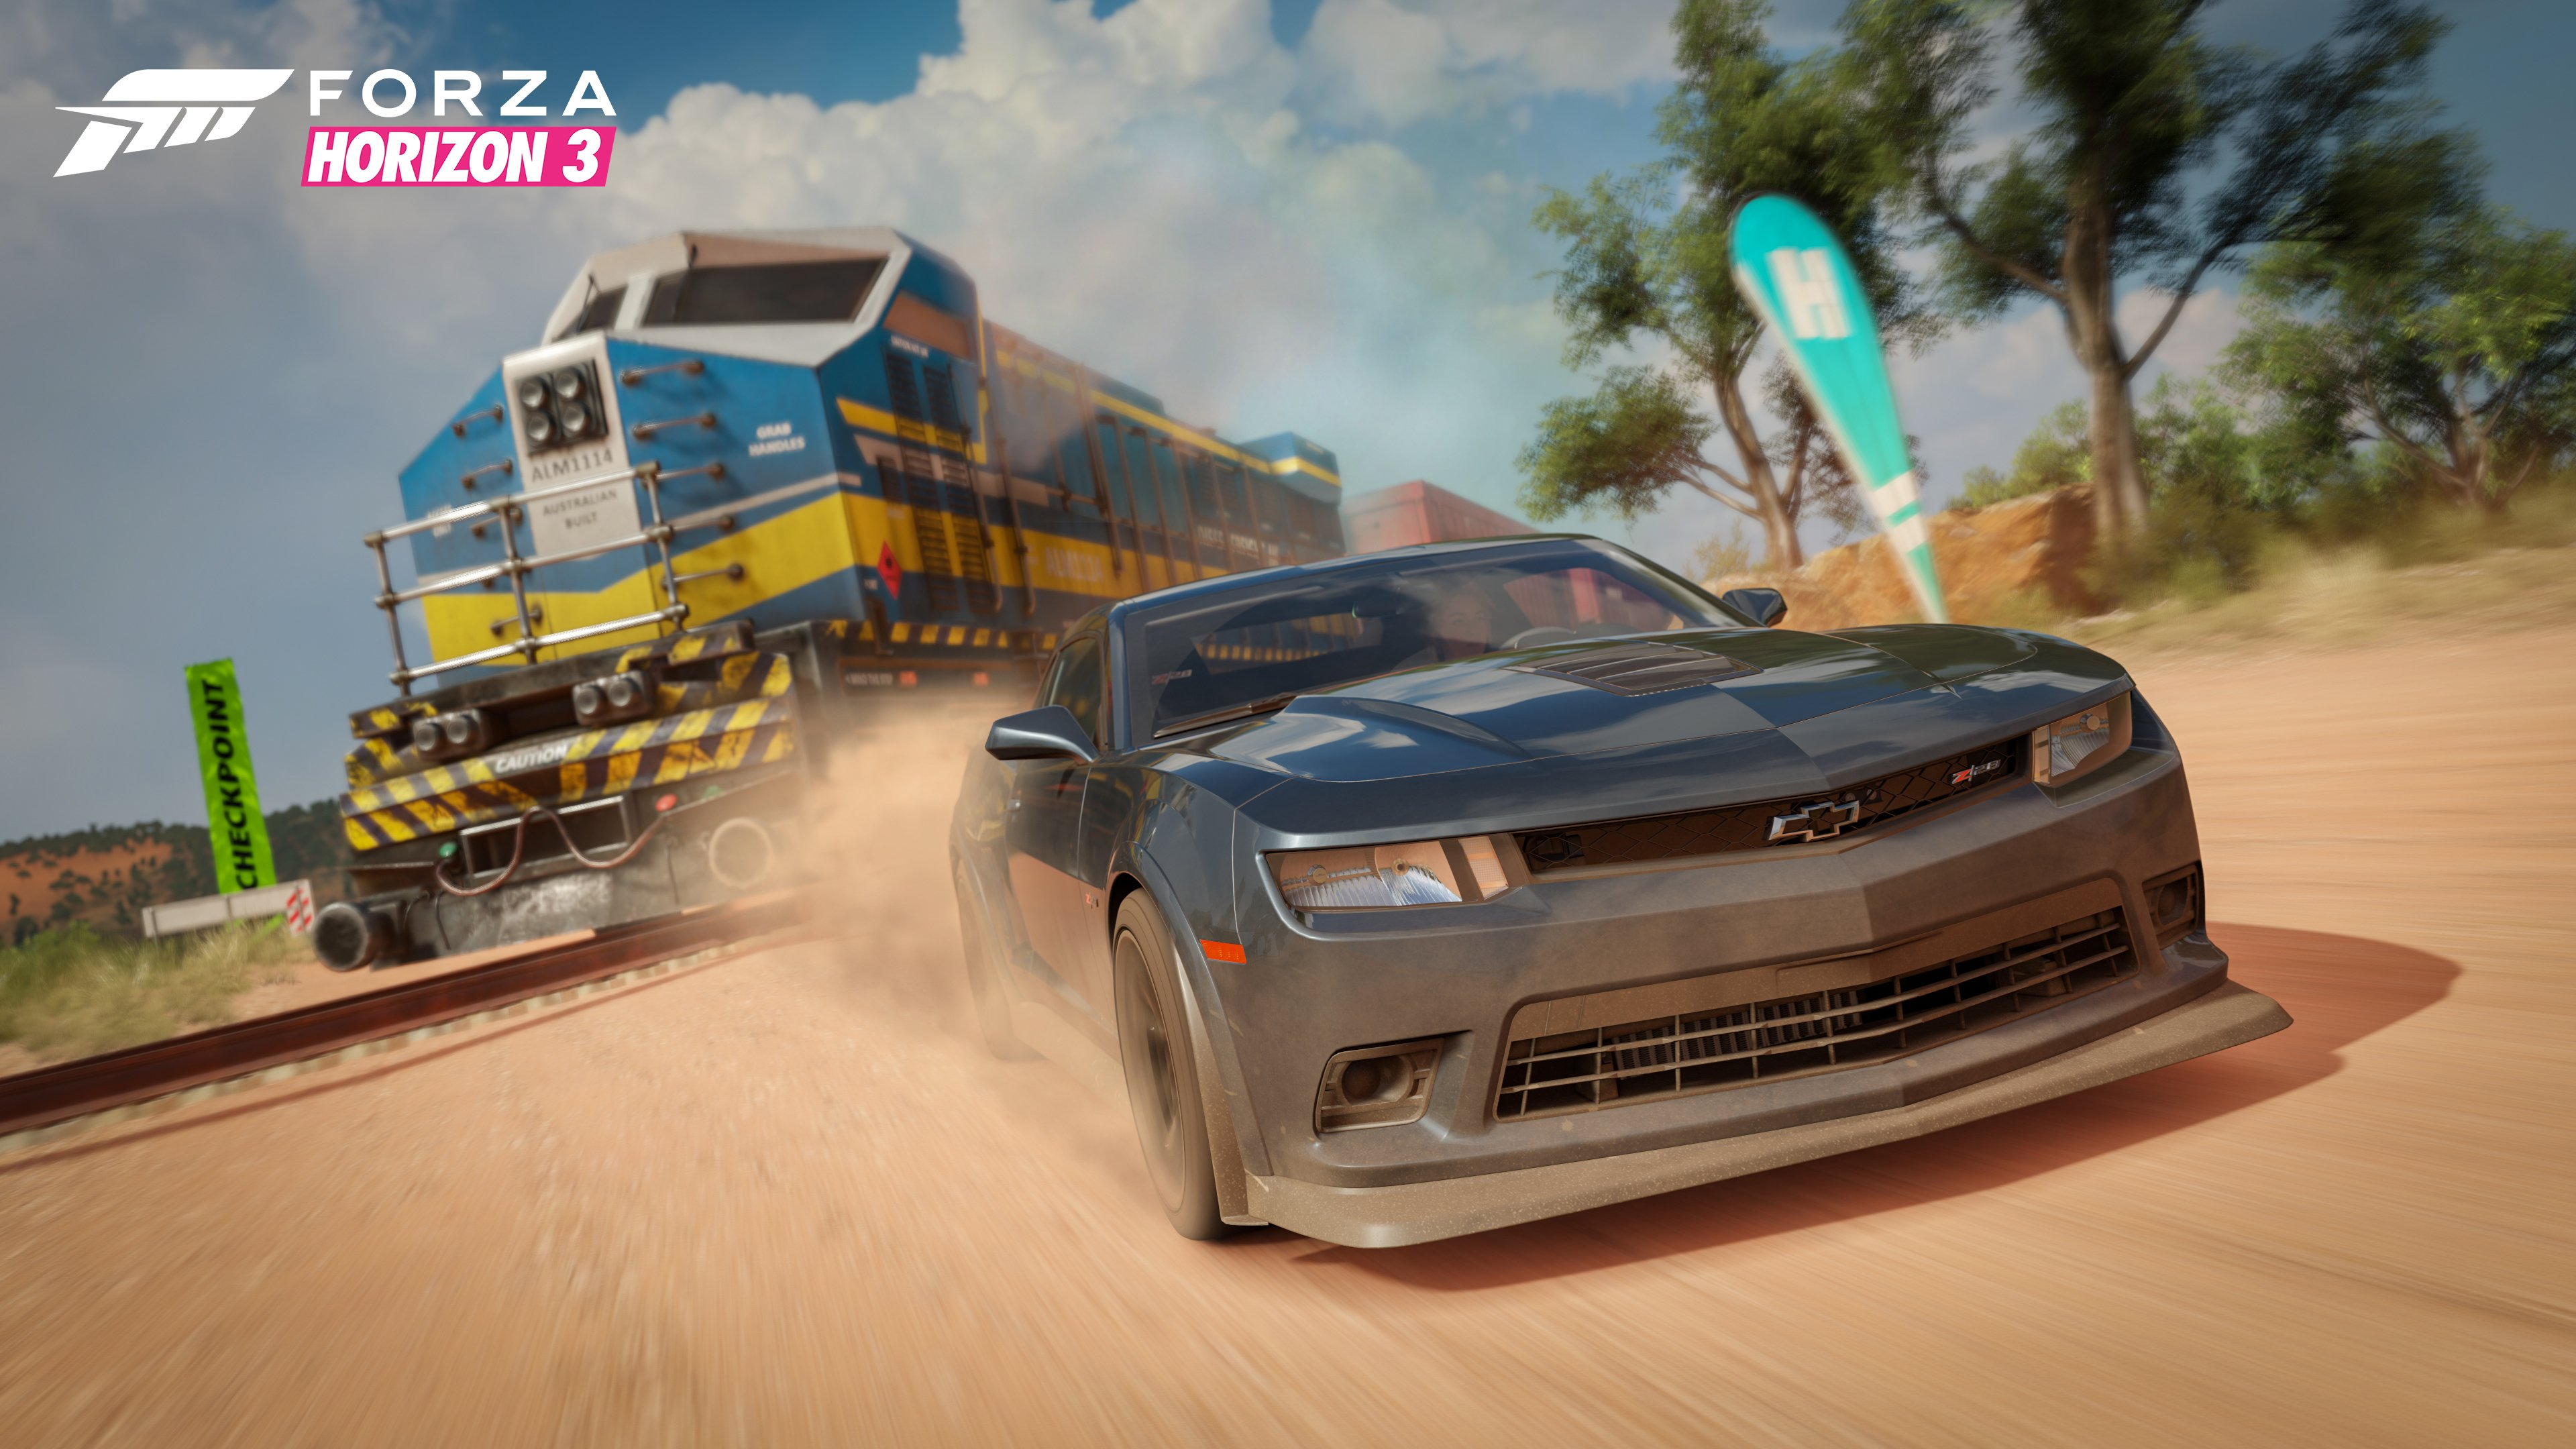 Forza Horizon 3 is racing toward a delisting